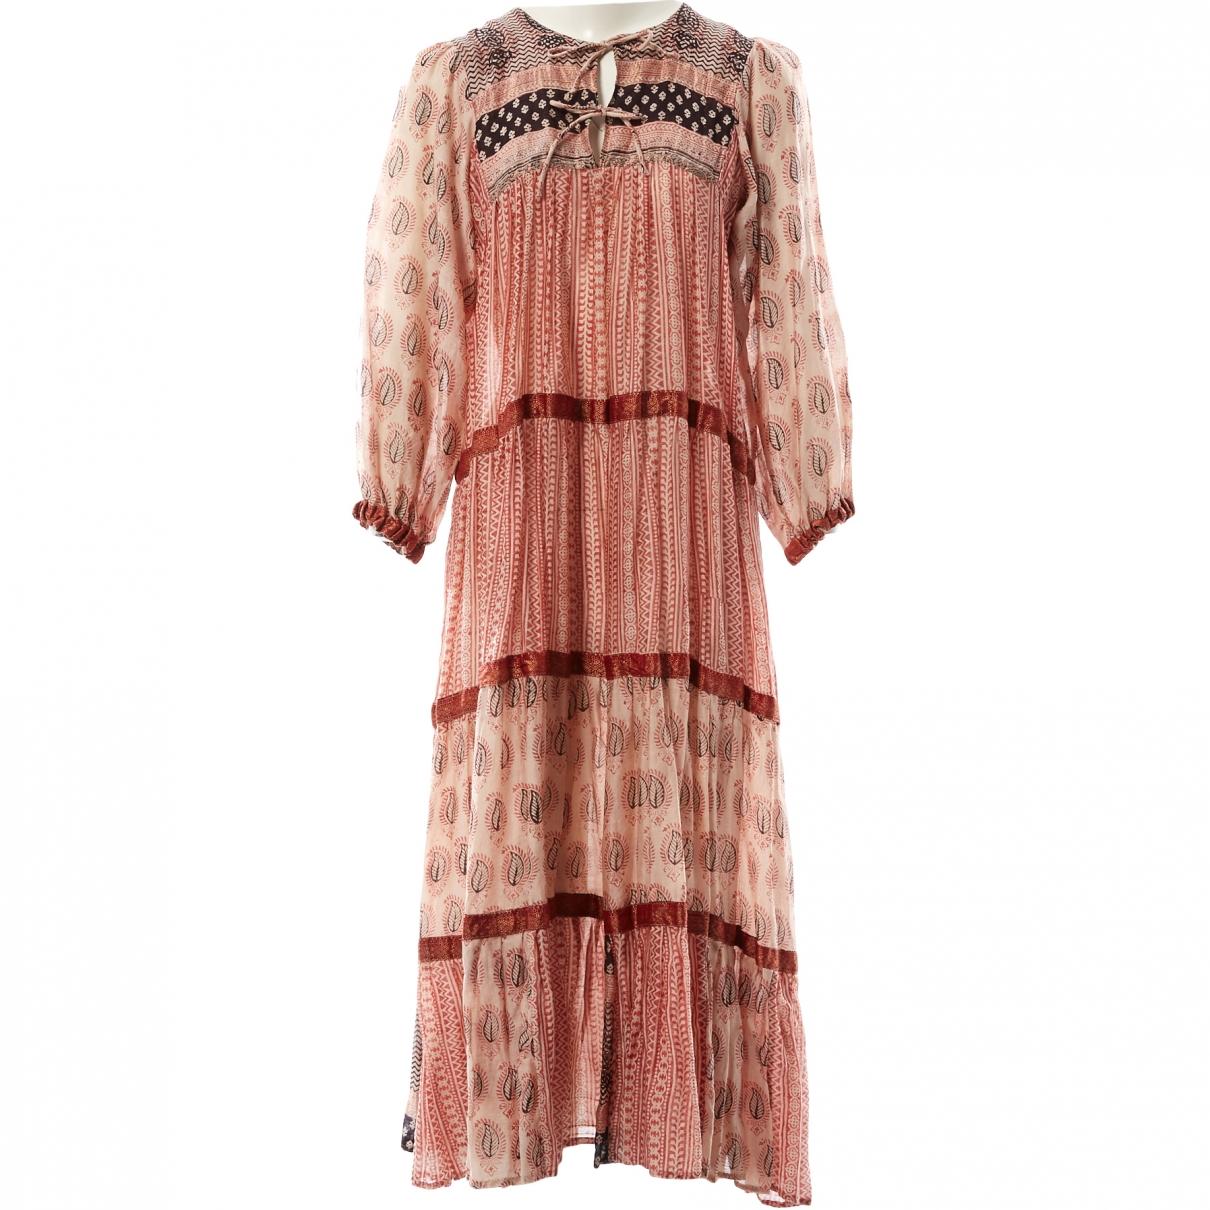 Non Signé / Unsigned \N Multicolour Cotton dress for Women One Size 0-5